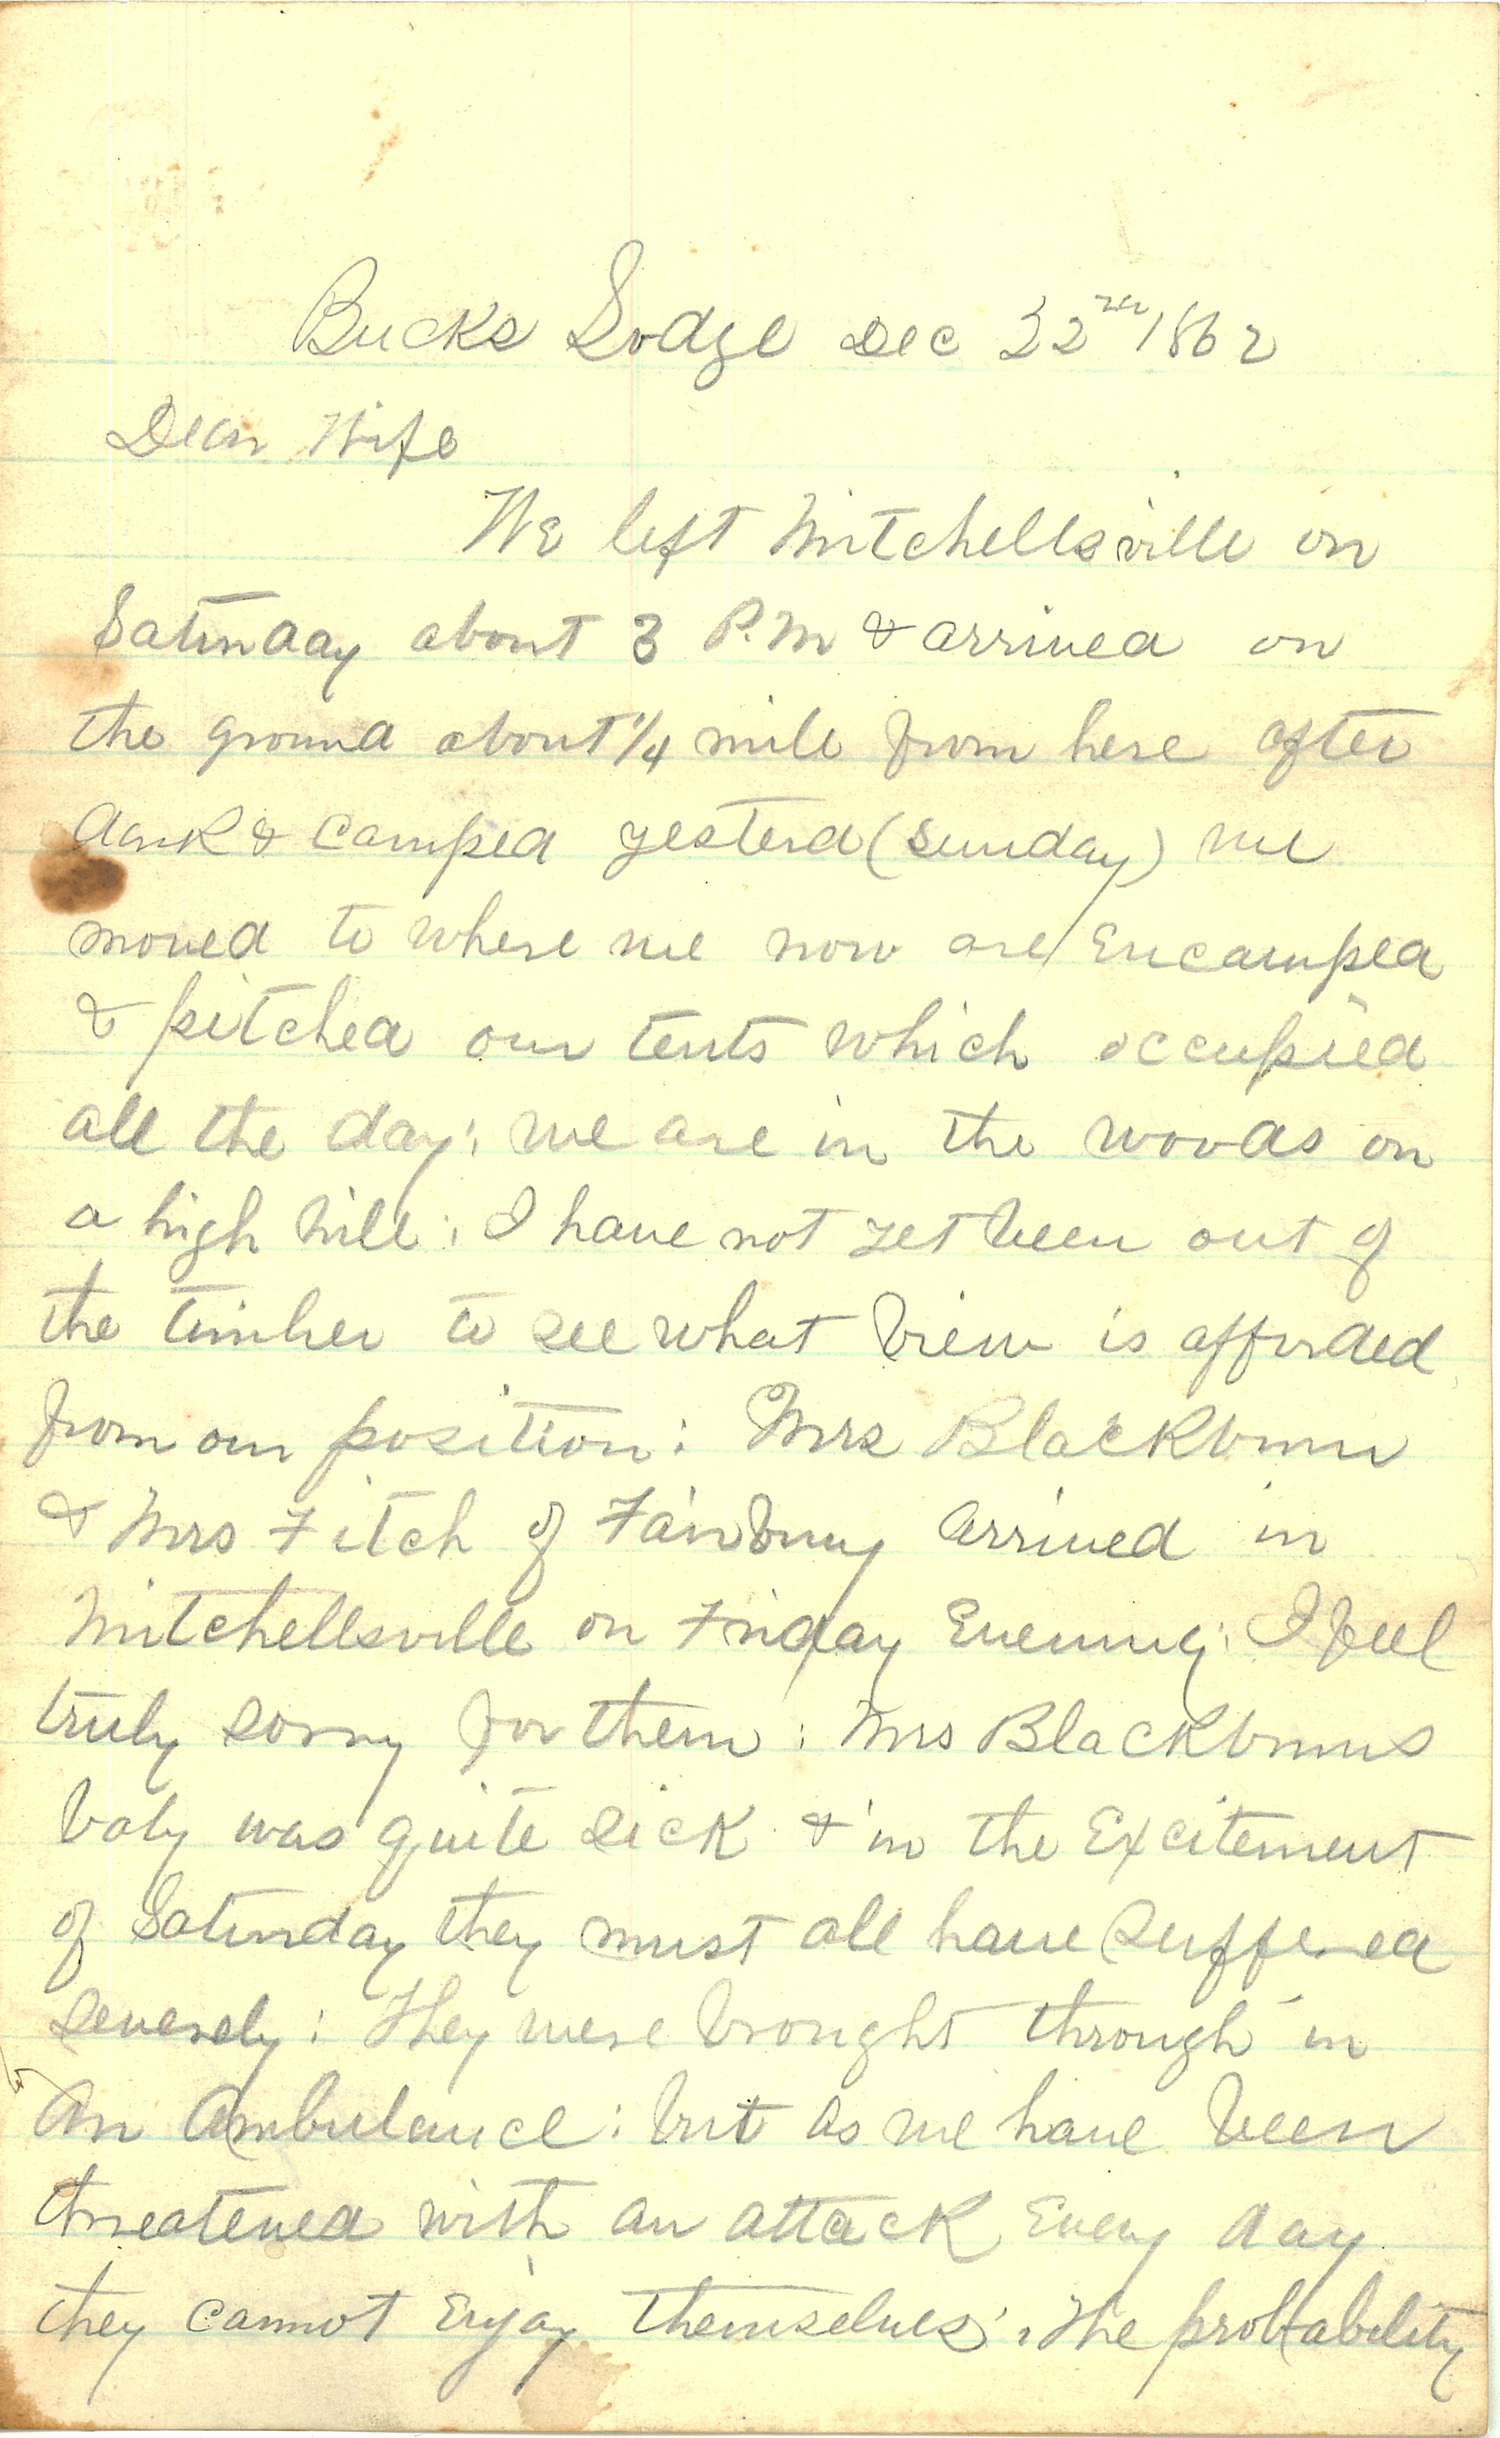 Joseph Culver Letter, December 22, 1862, Page 1